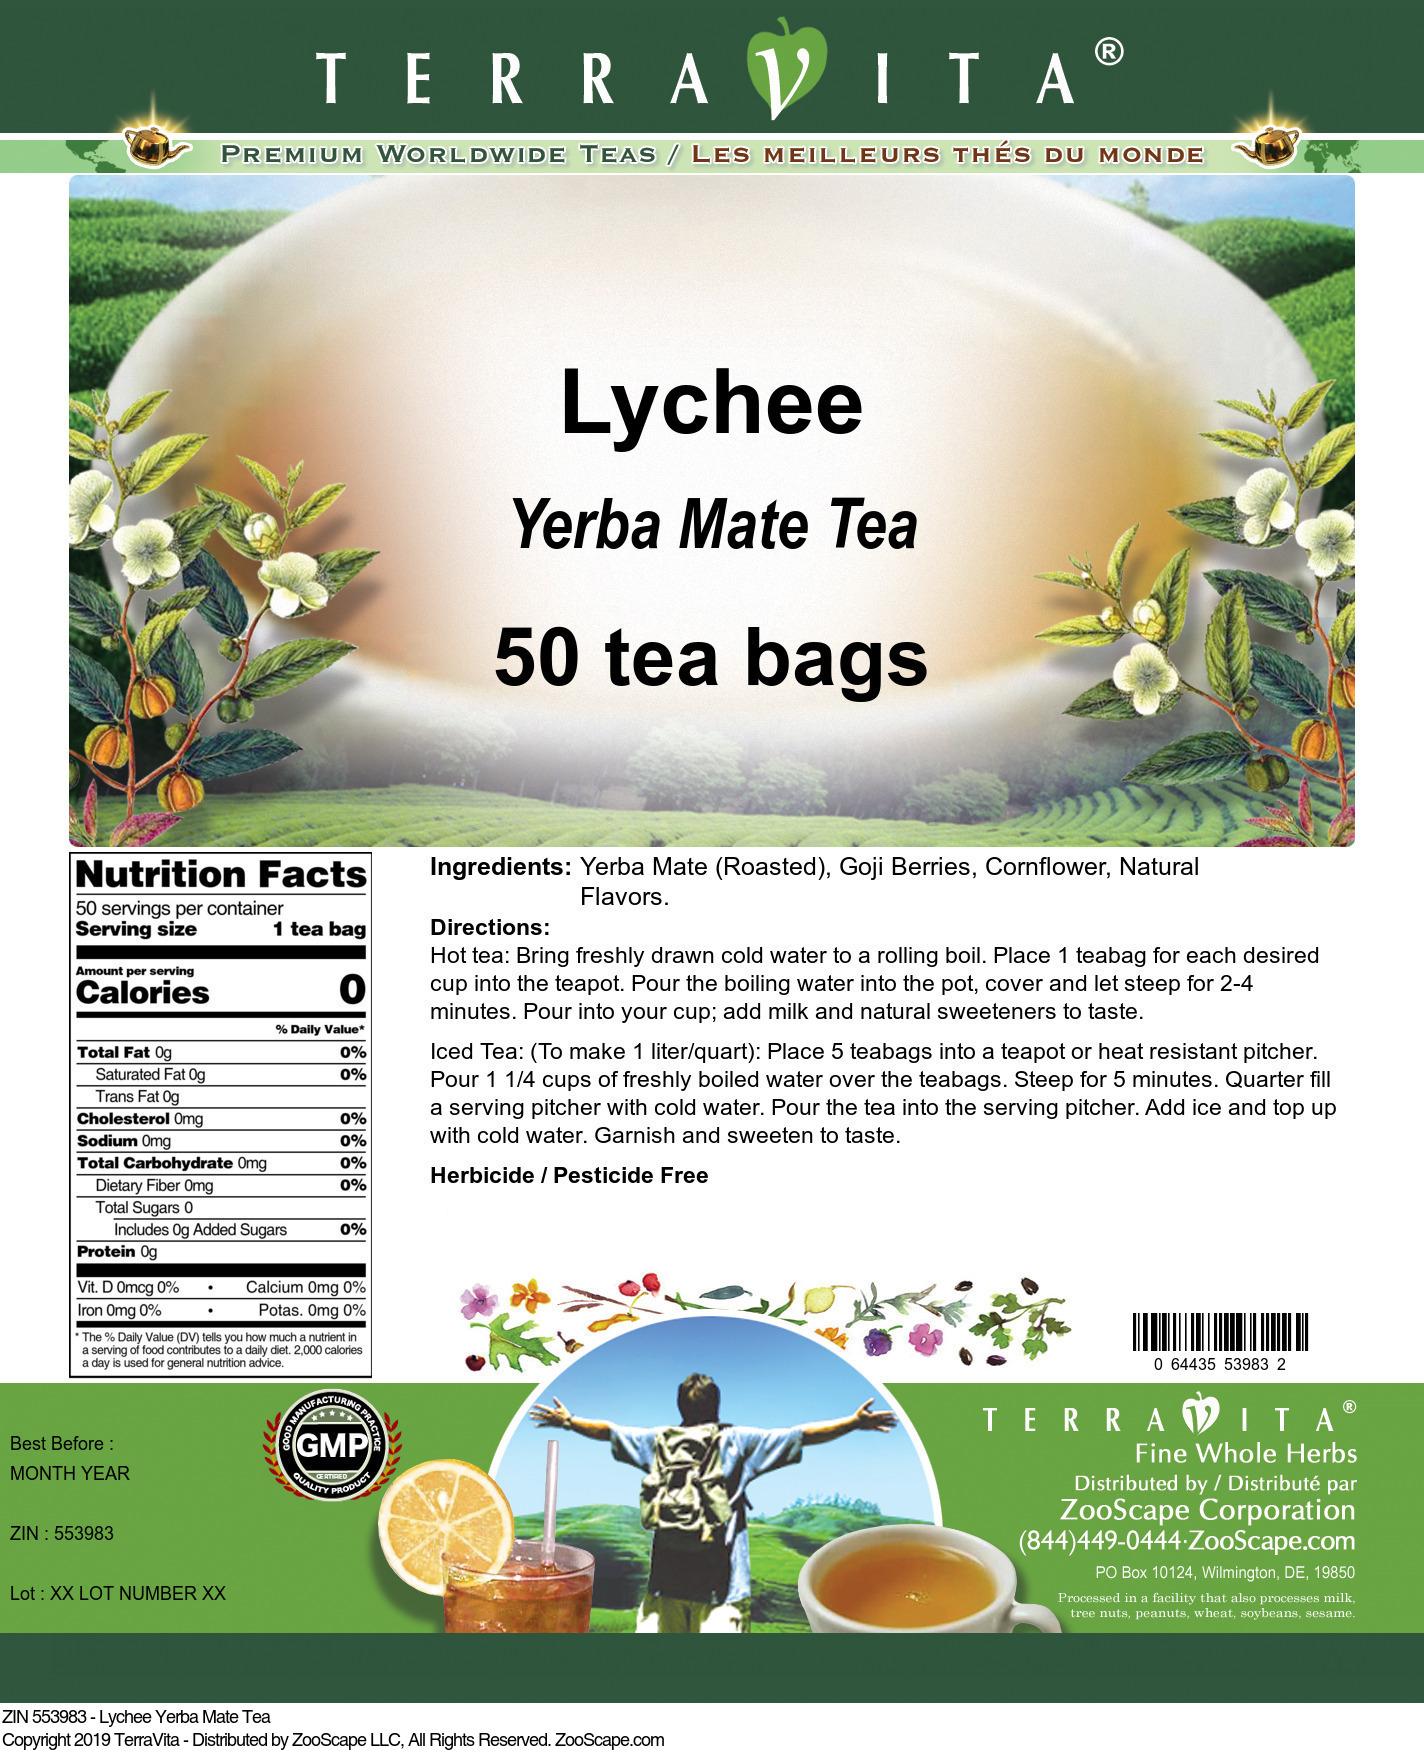 Lychee Yerba Mate Tea